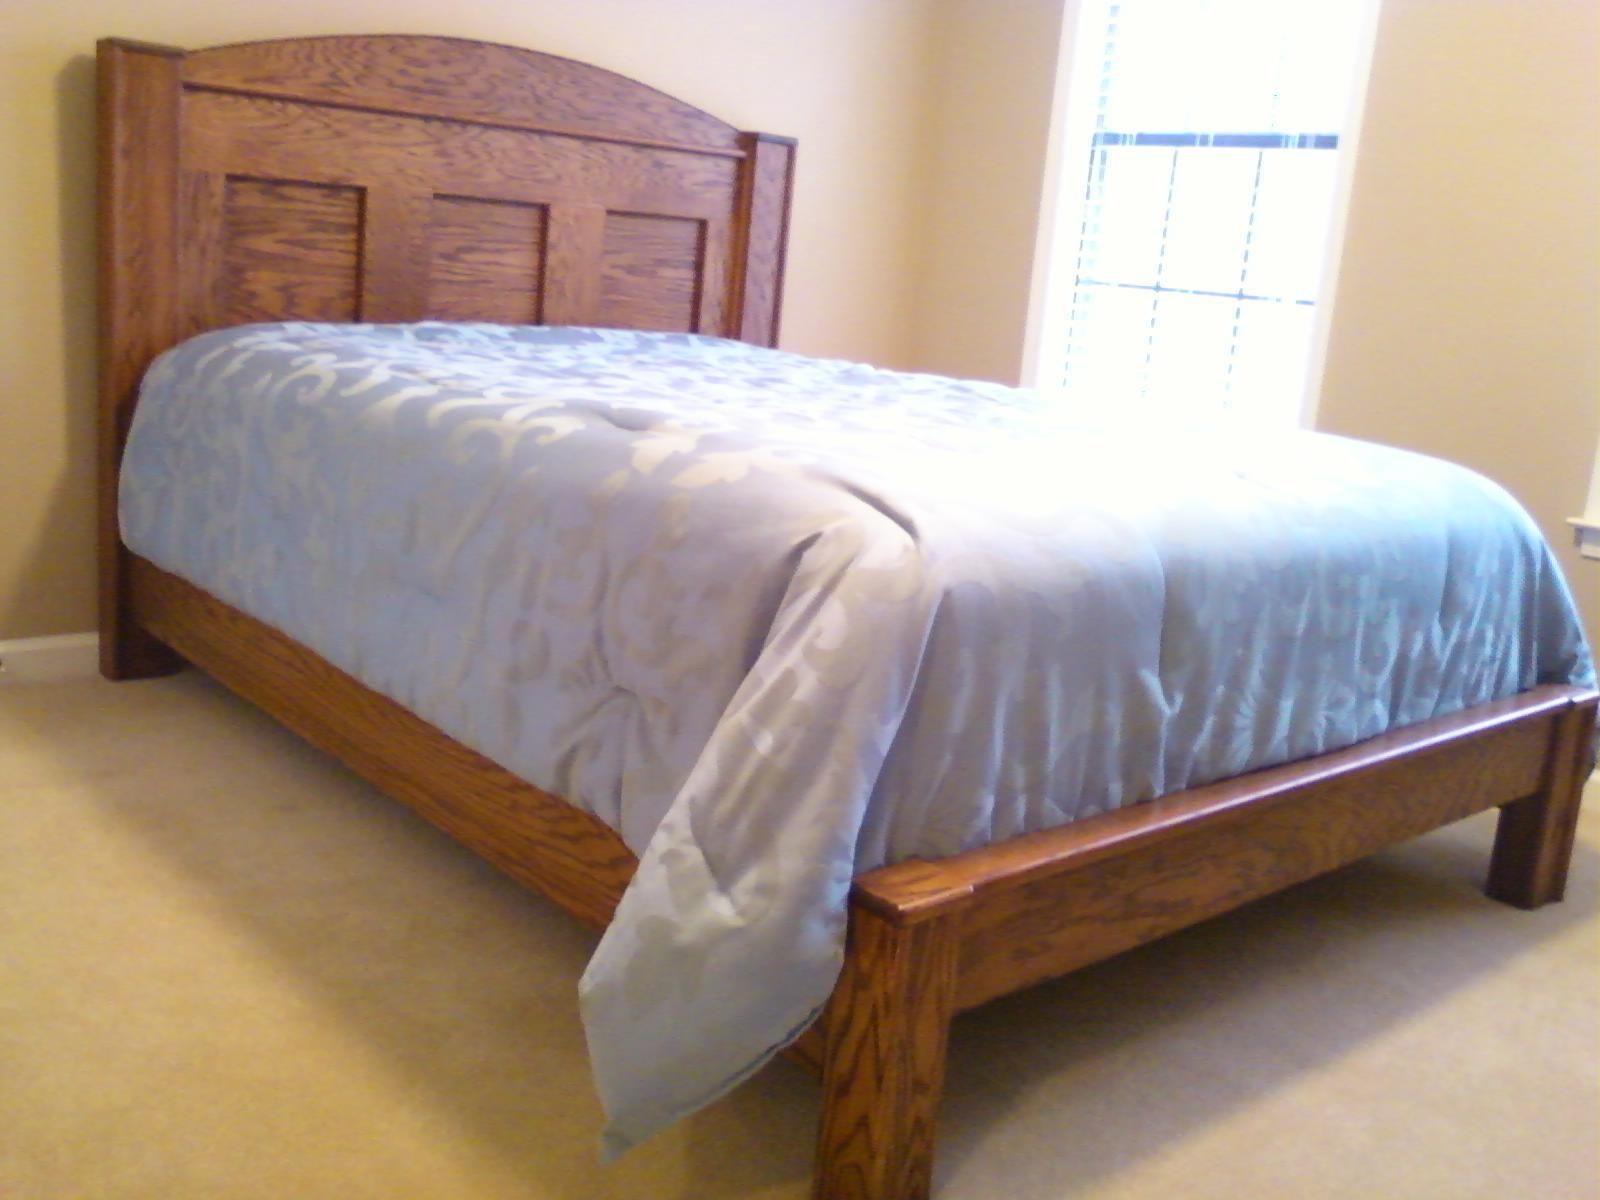 selfdesigned Ranch style queen bed headboard, footboard